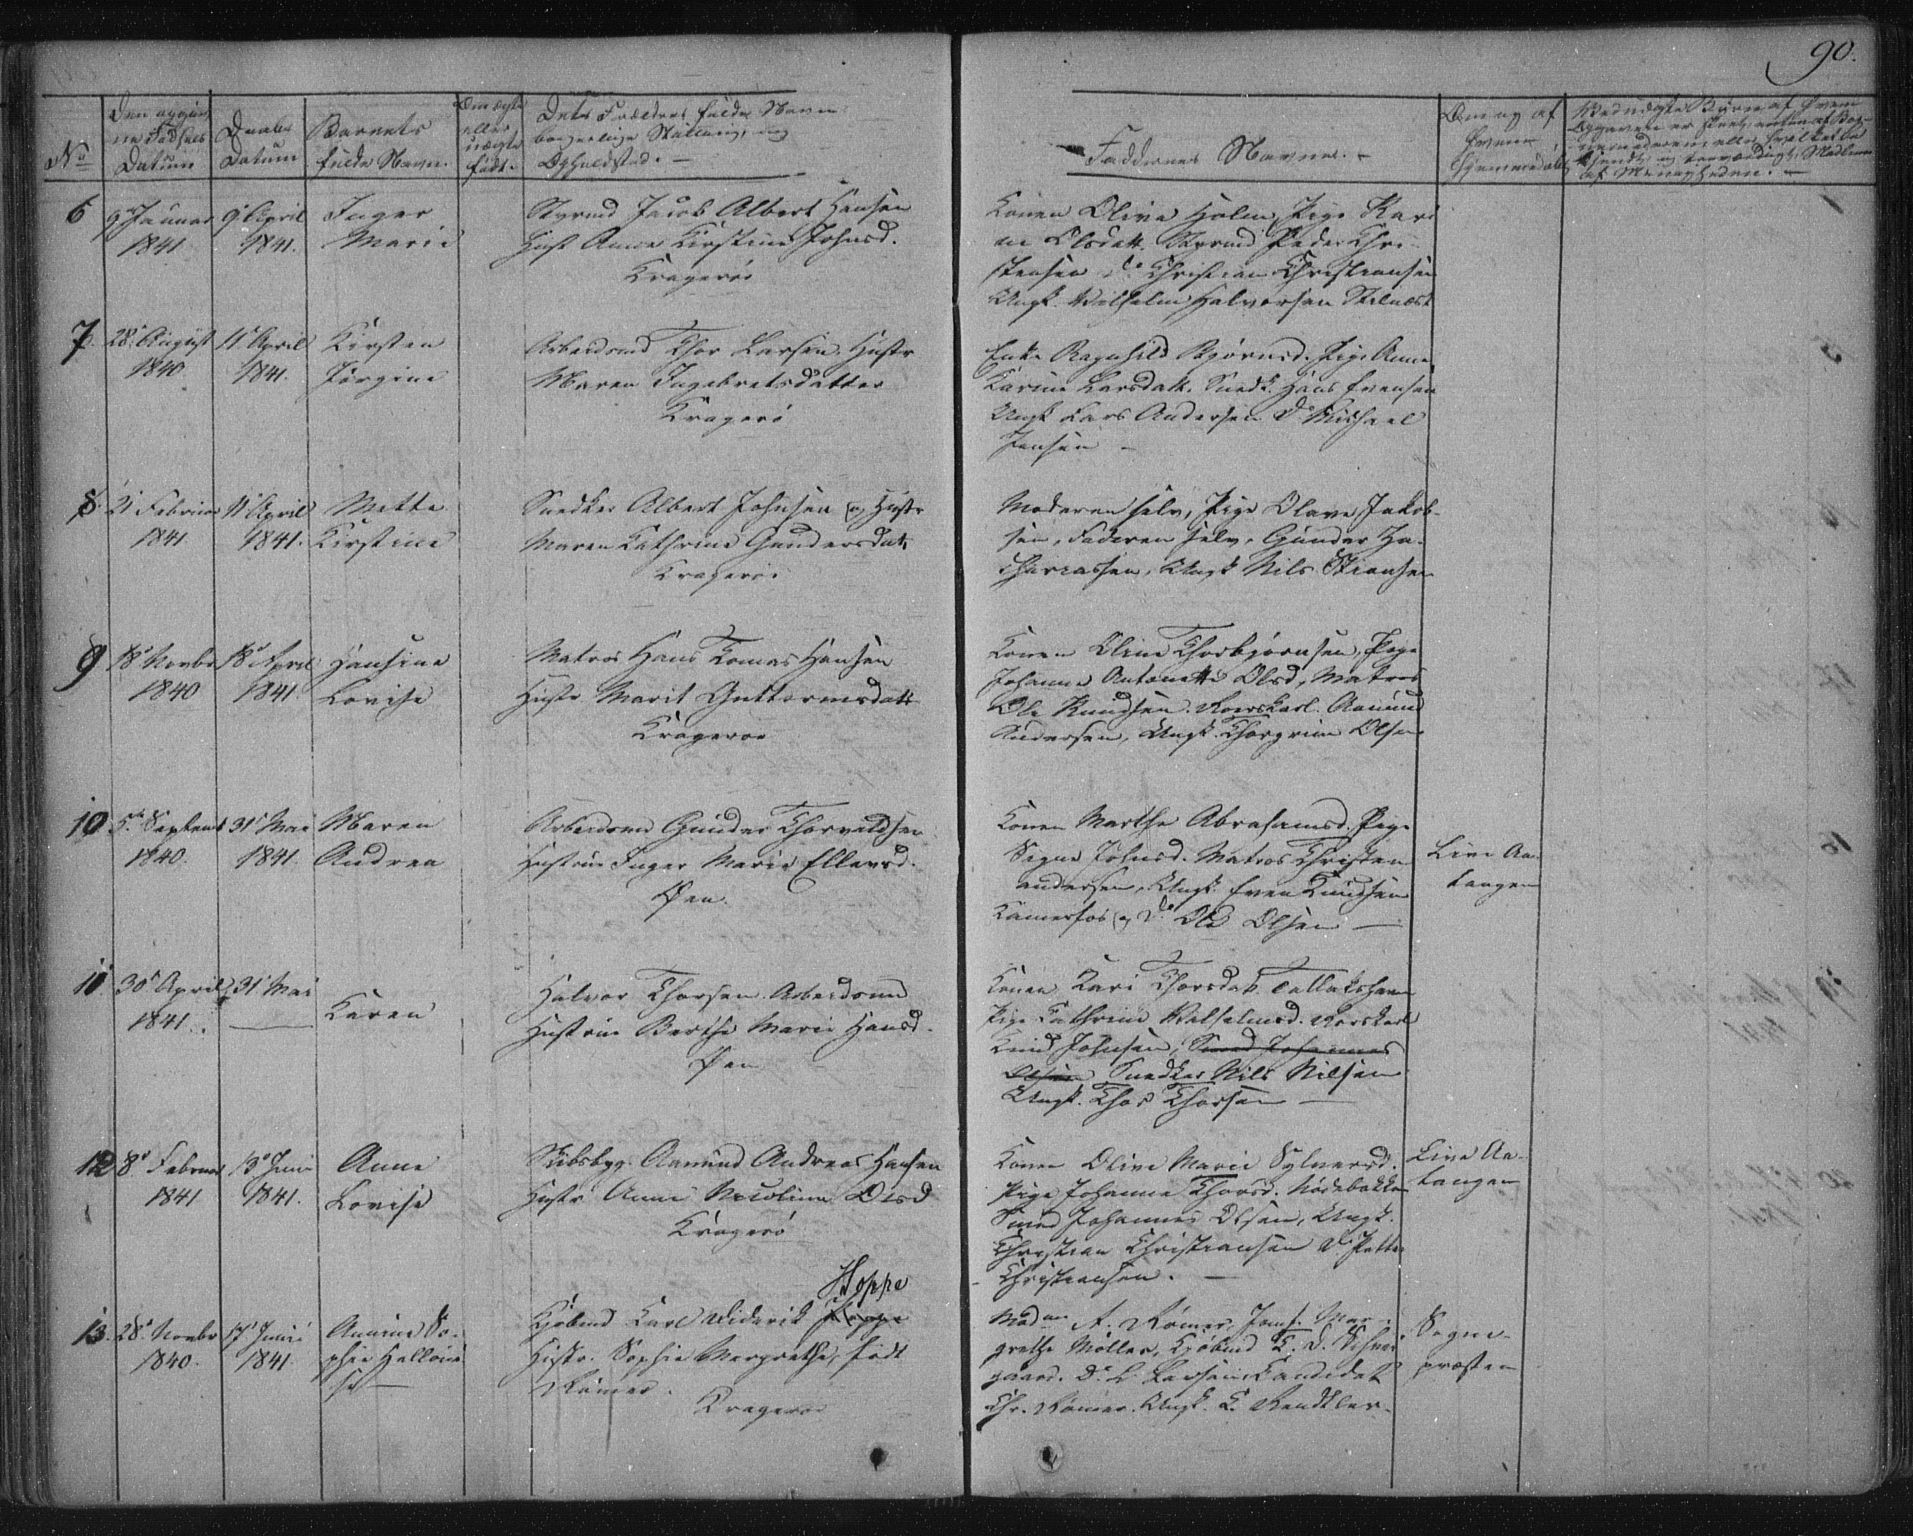 SAKO, Kragerø kirkebøker, F/Fa/L0005: Ministerialbok nr. 5, 1832-1847, s. 90